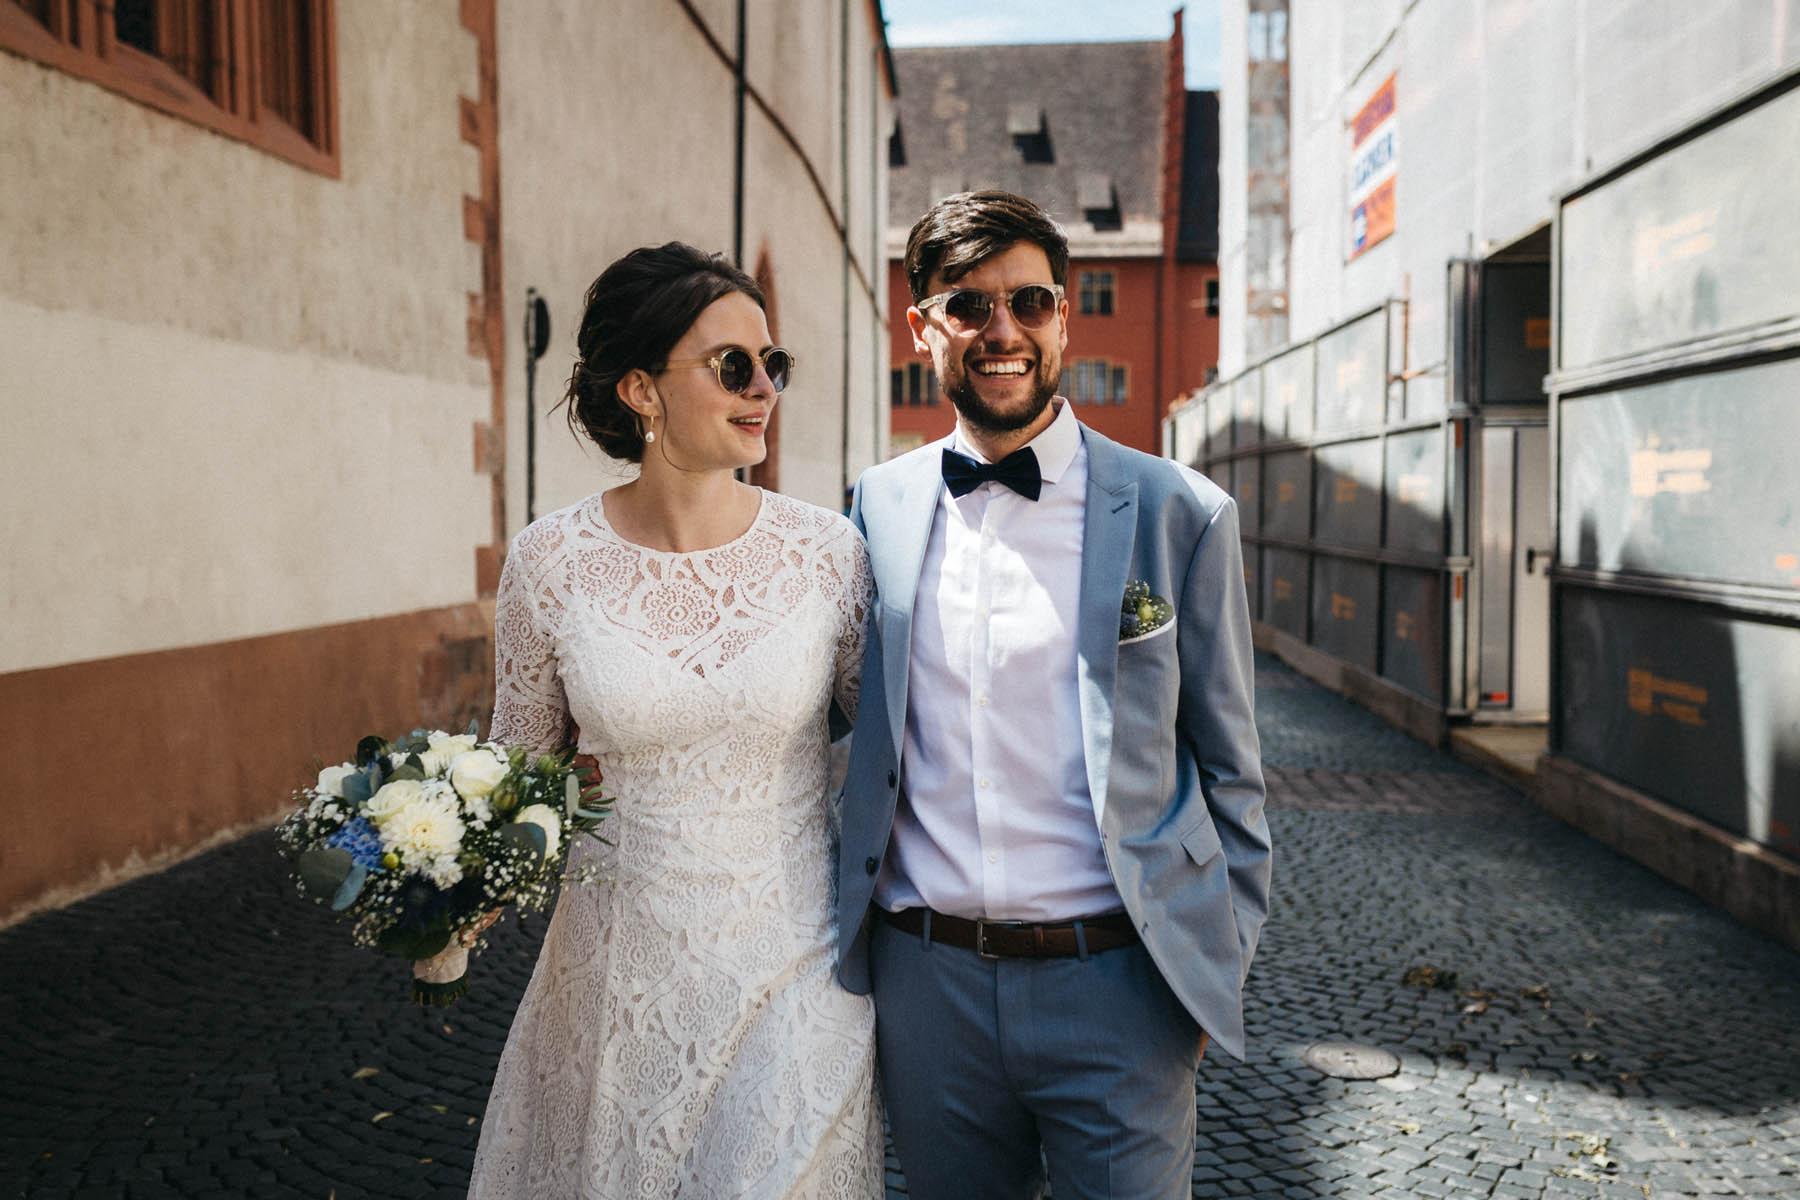 raissa simon fotografie elopement freiburg standesamt 045 - Julia + Tobias